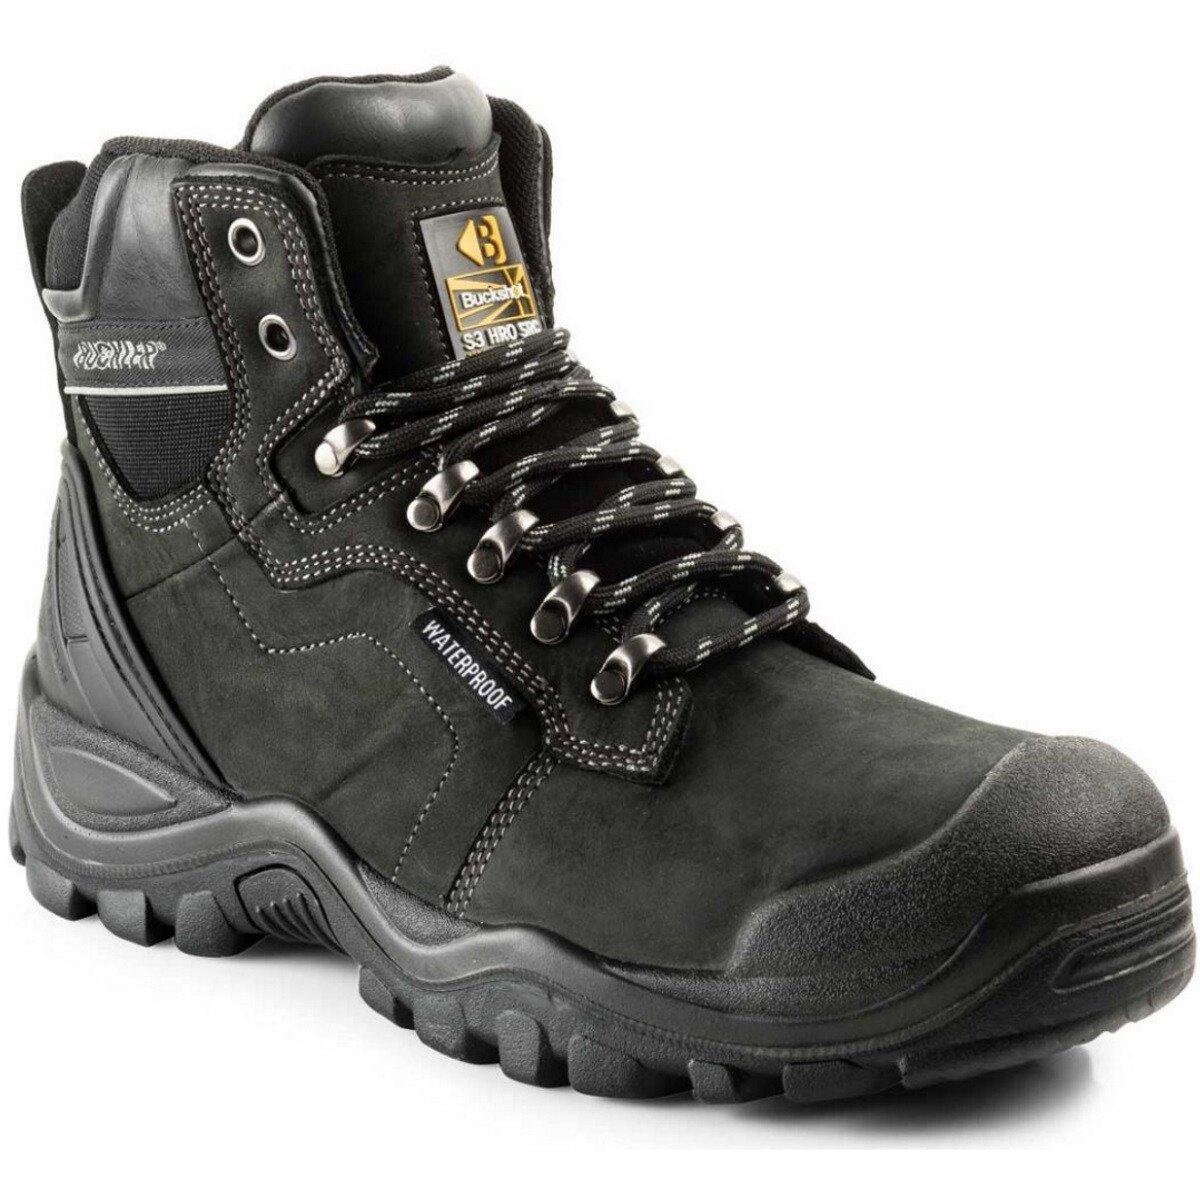 Buckler Boots BSH009WP Buckshot 2 Leather S3 Safety Lace Boot HRO WRU SRC